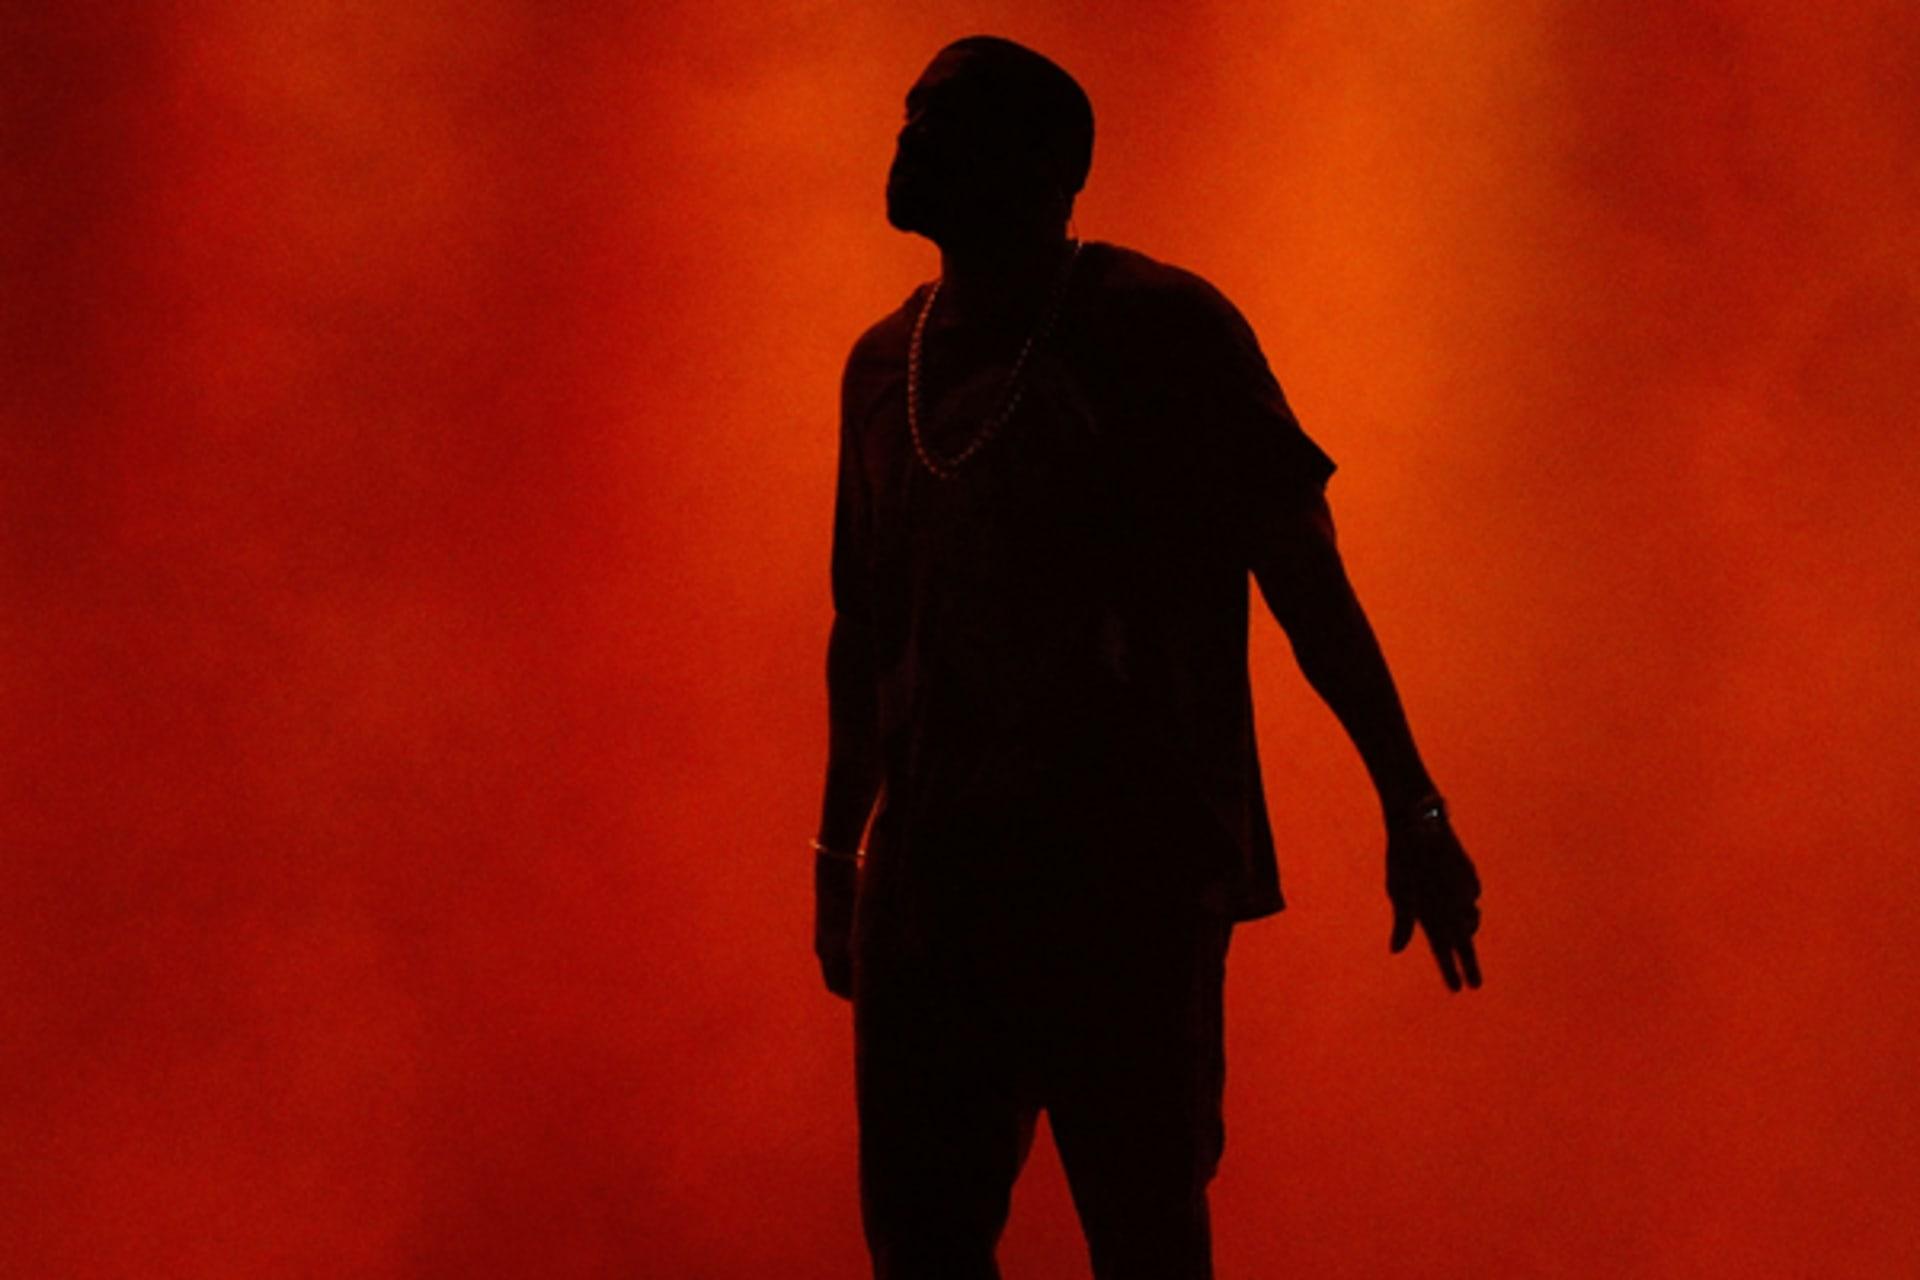 c37eda0cdb573e Kanye West Albums Ranked Best To Worst